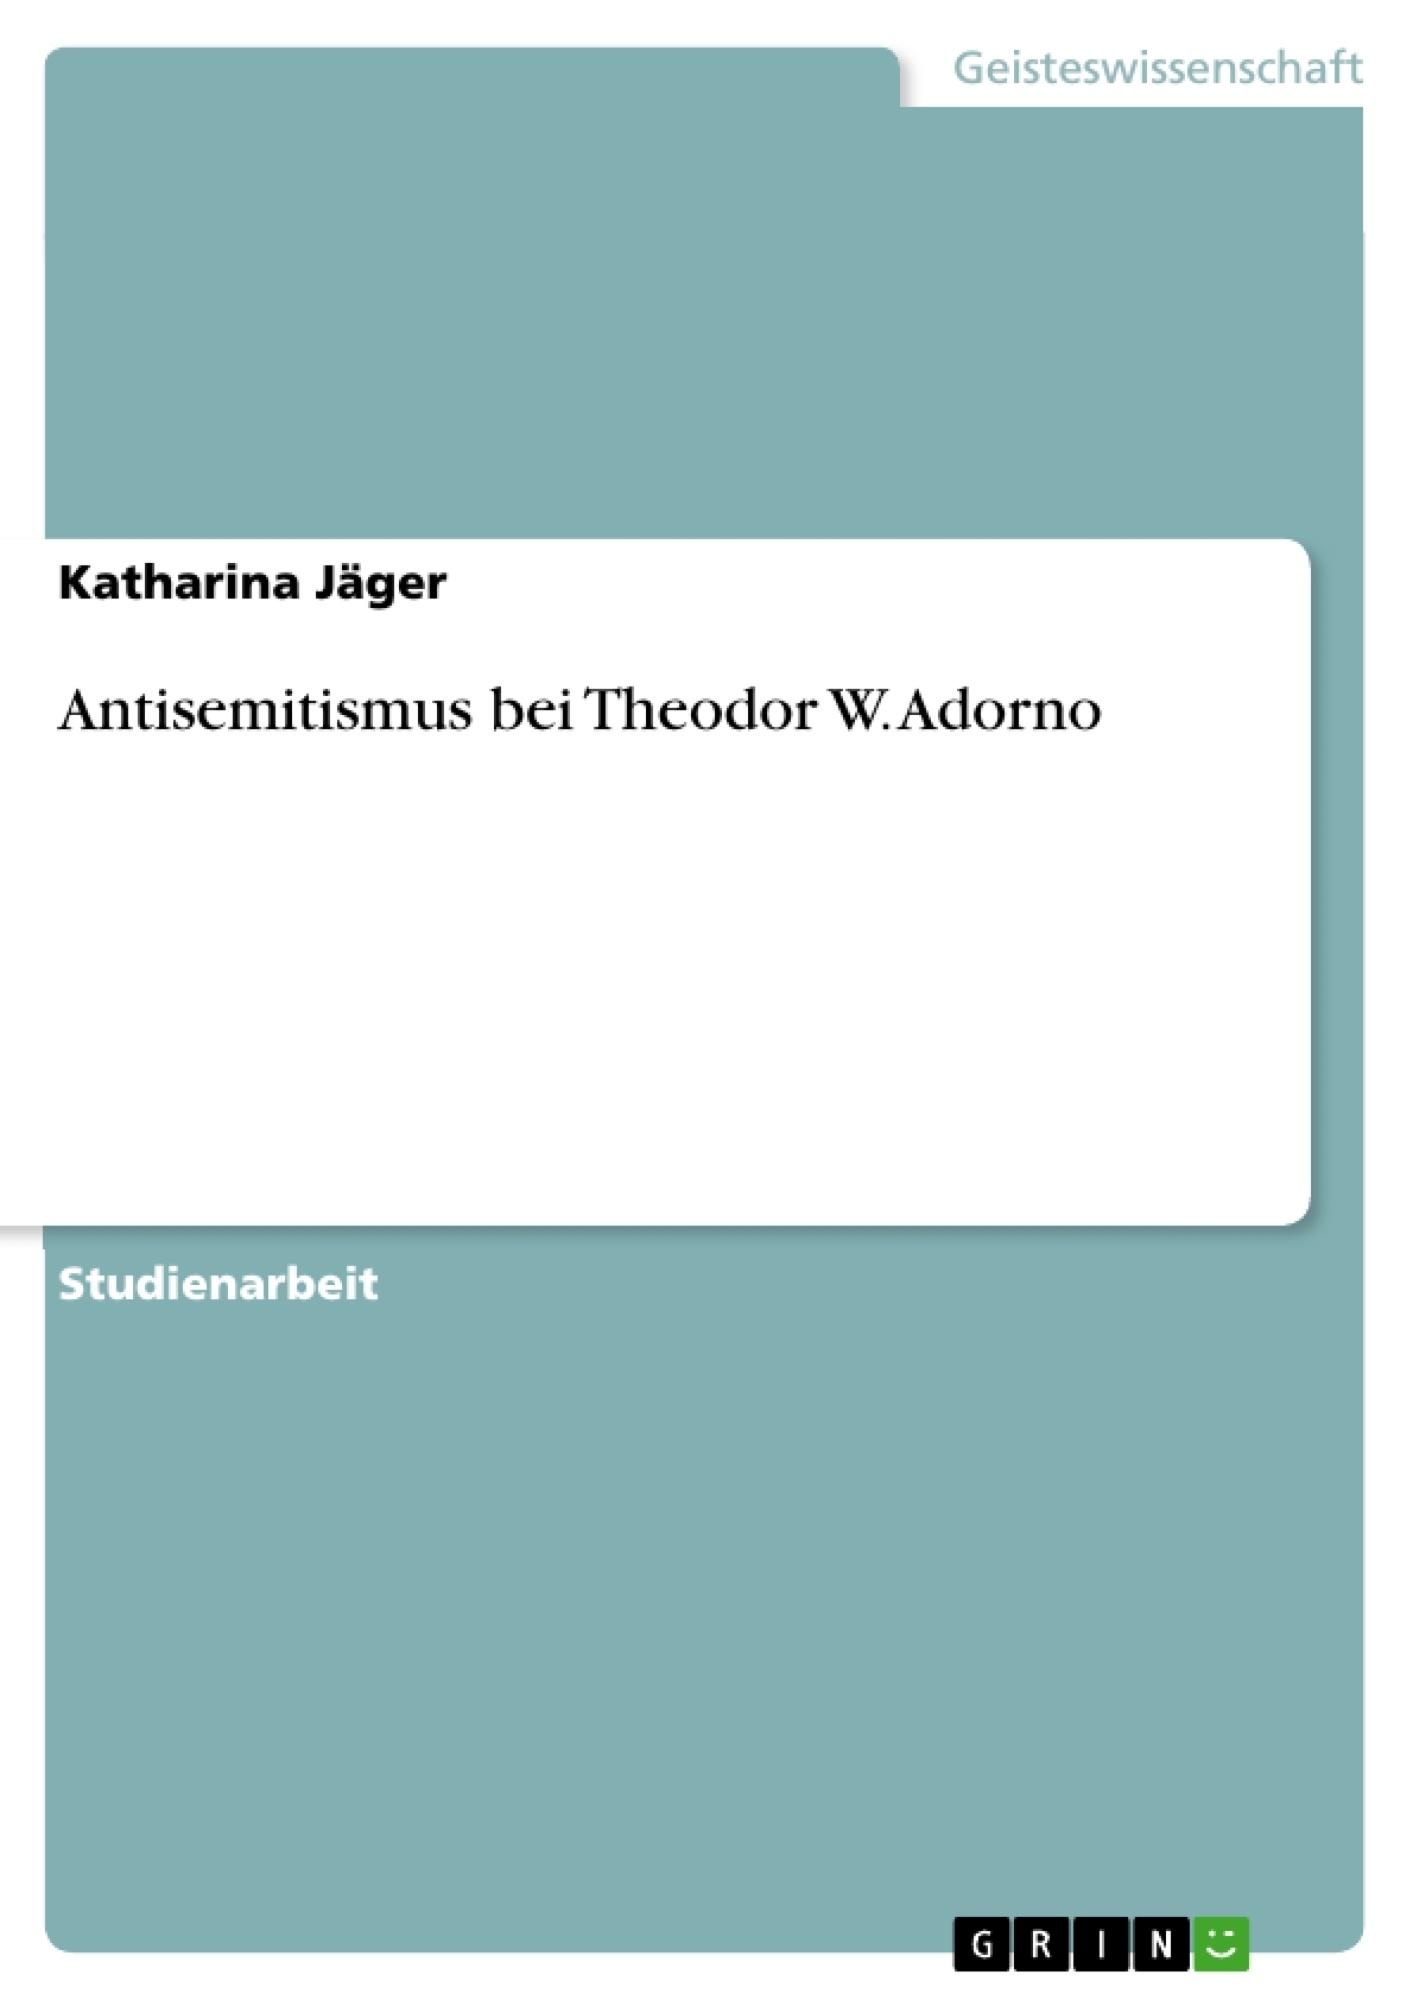 Titel: Antisemitismus bei Theodor W. Adorno